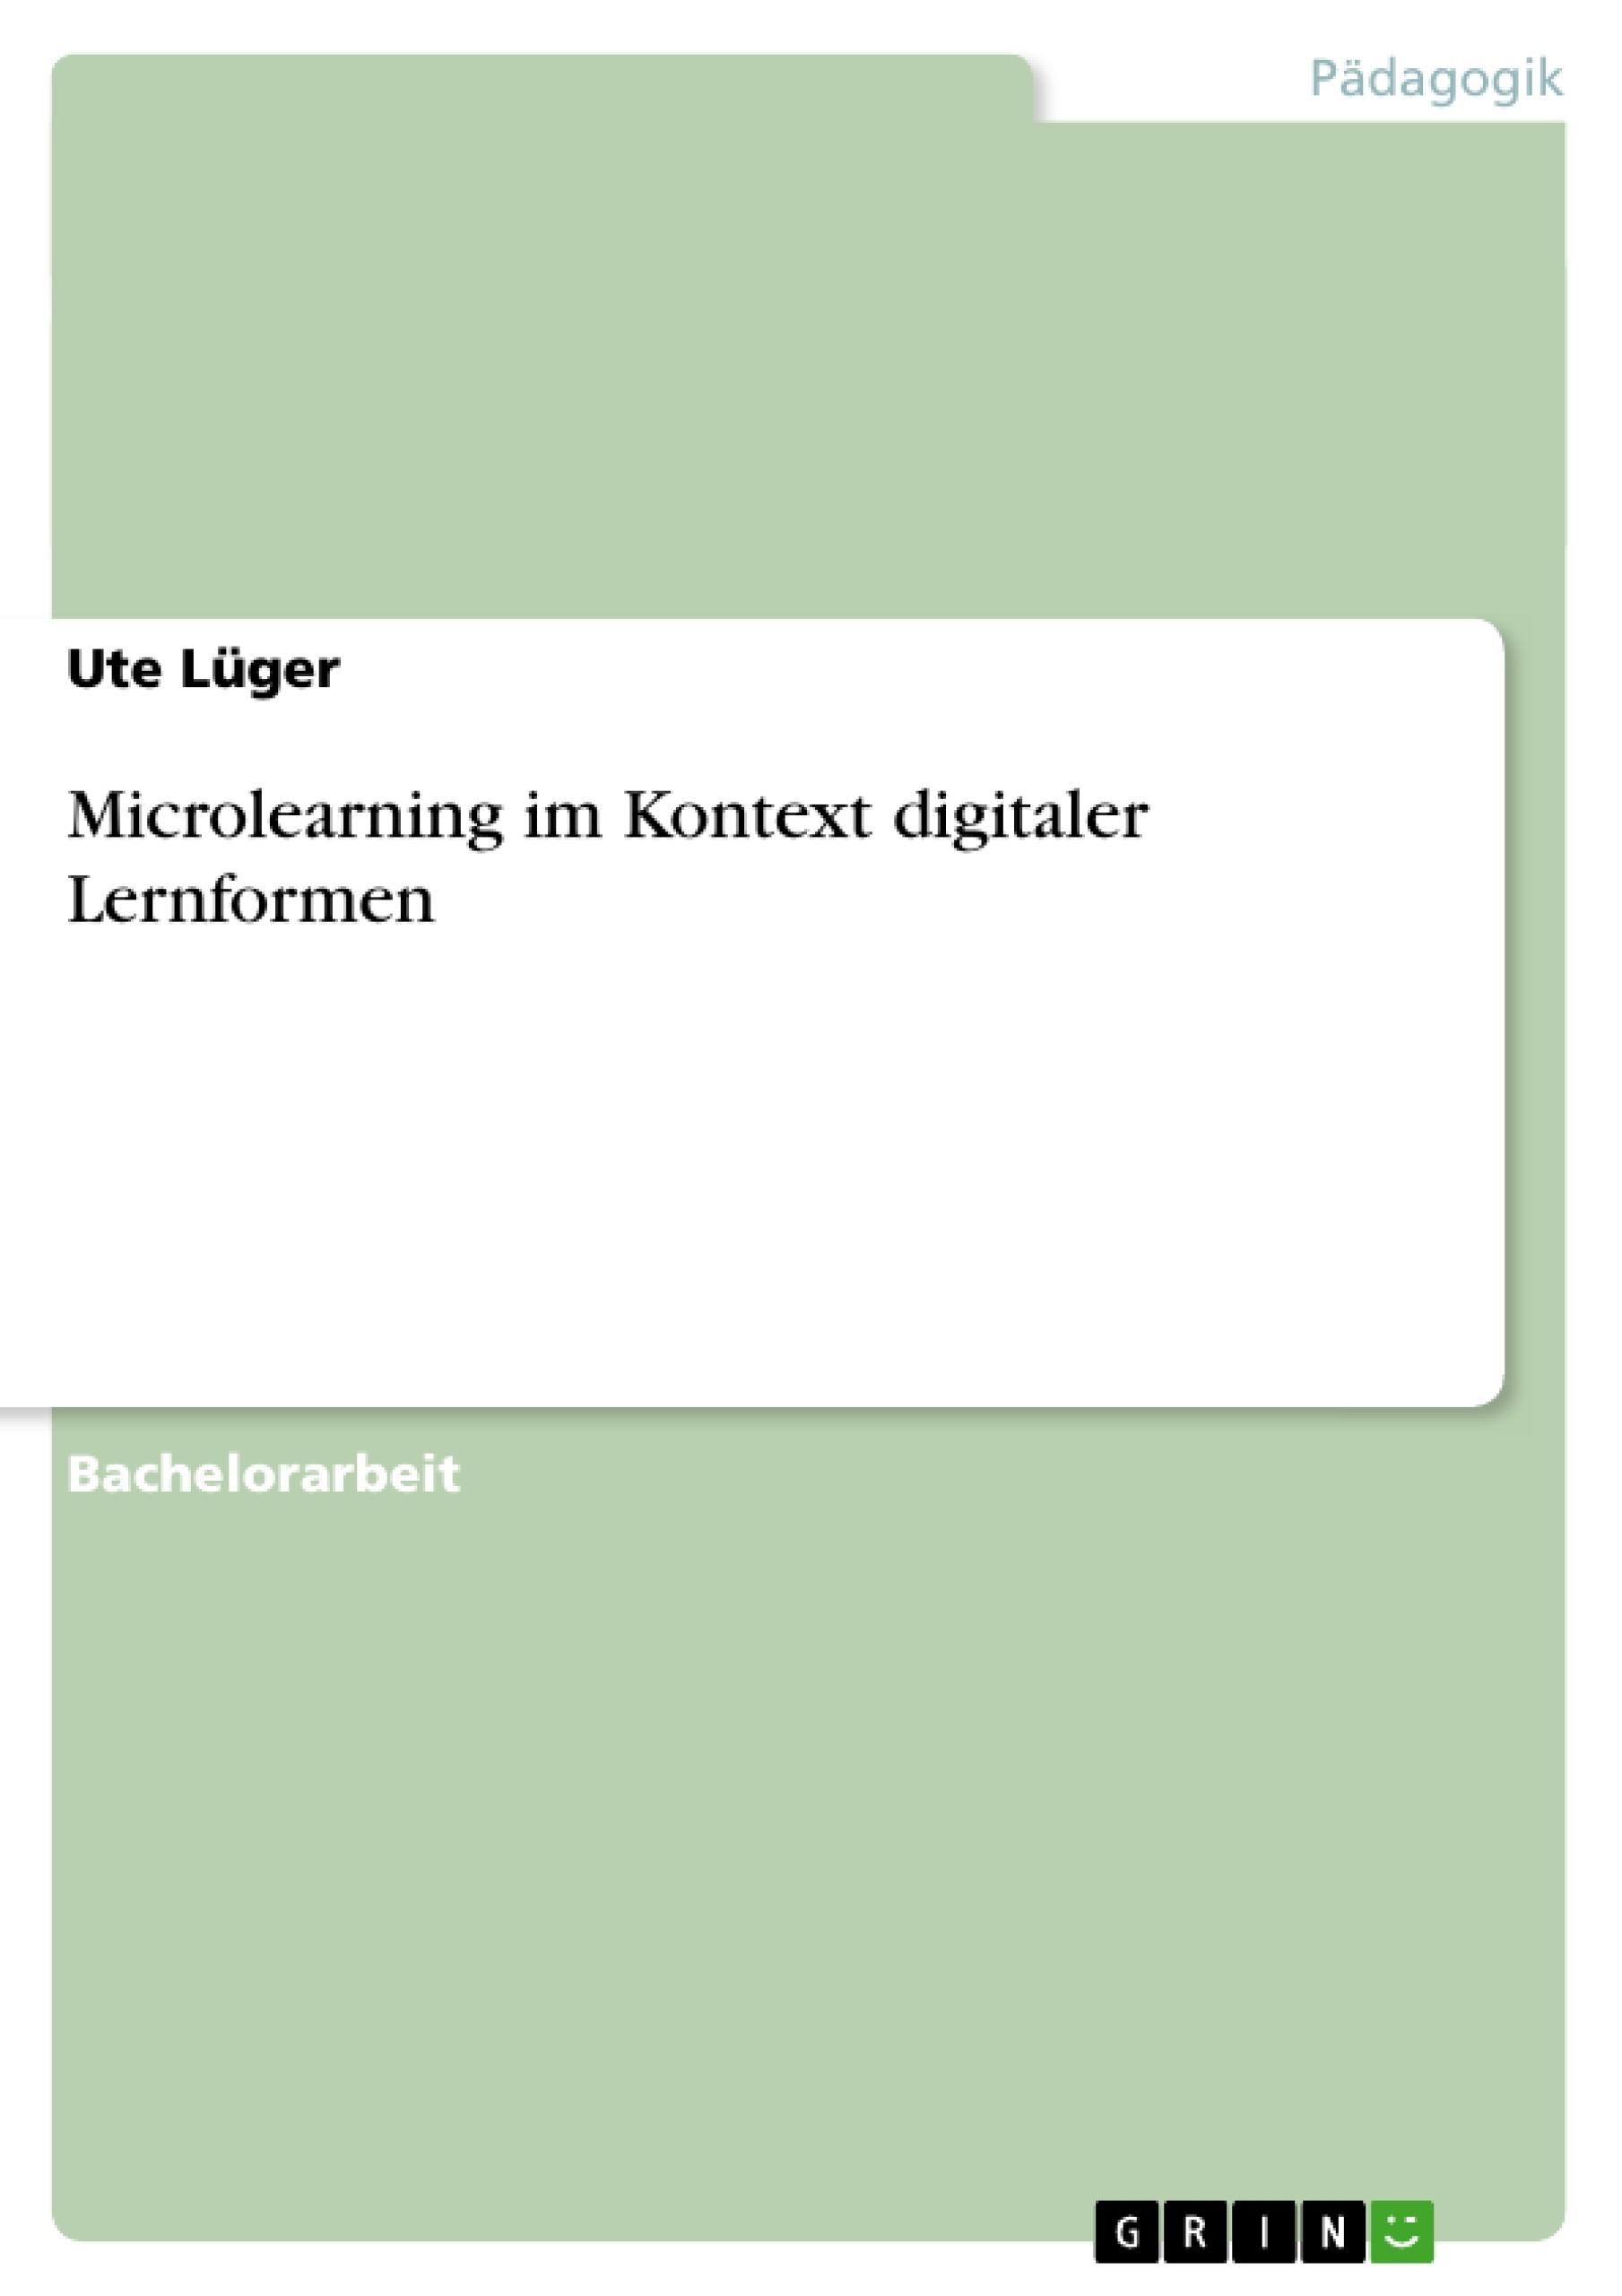 Titel: Microlearning im Kontext digitaler Lernformen